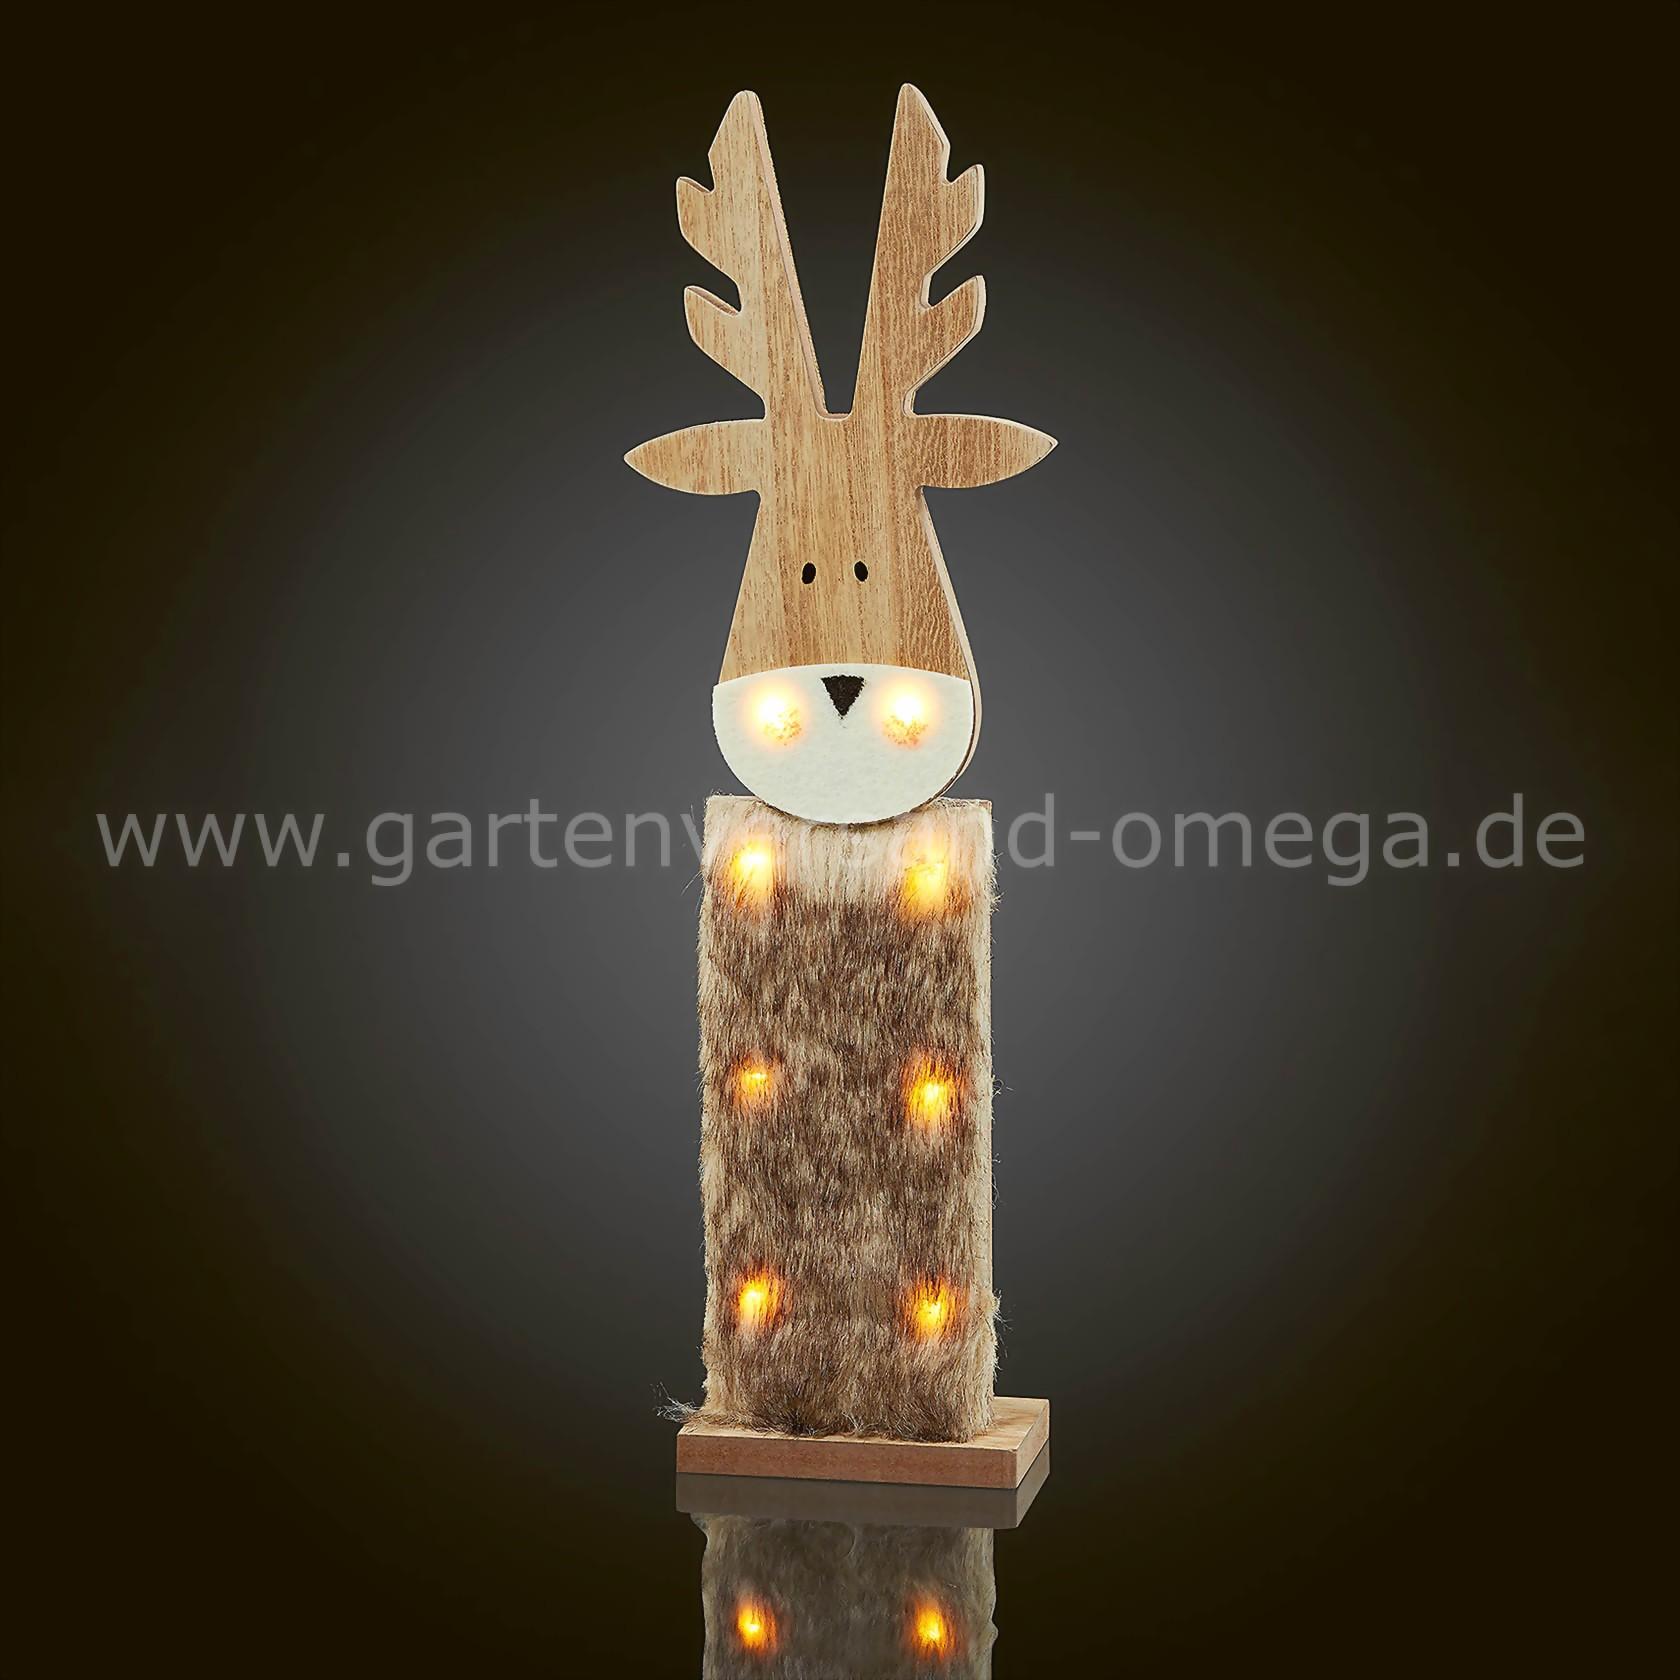 led holzrentier batteriebetriebene weihnachtsbeleuchtung beleuchtetes holzrentier. Black Bedroom Furniture Sets. Home Design Ideas